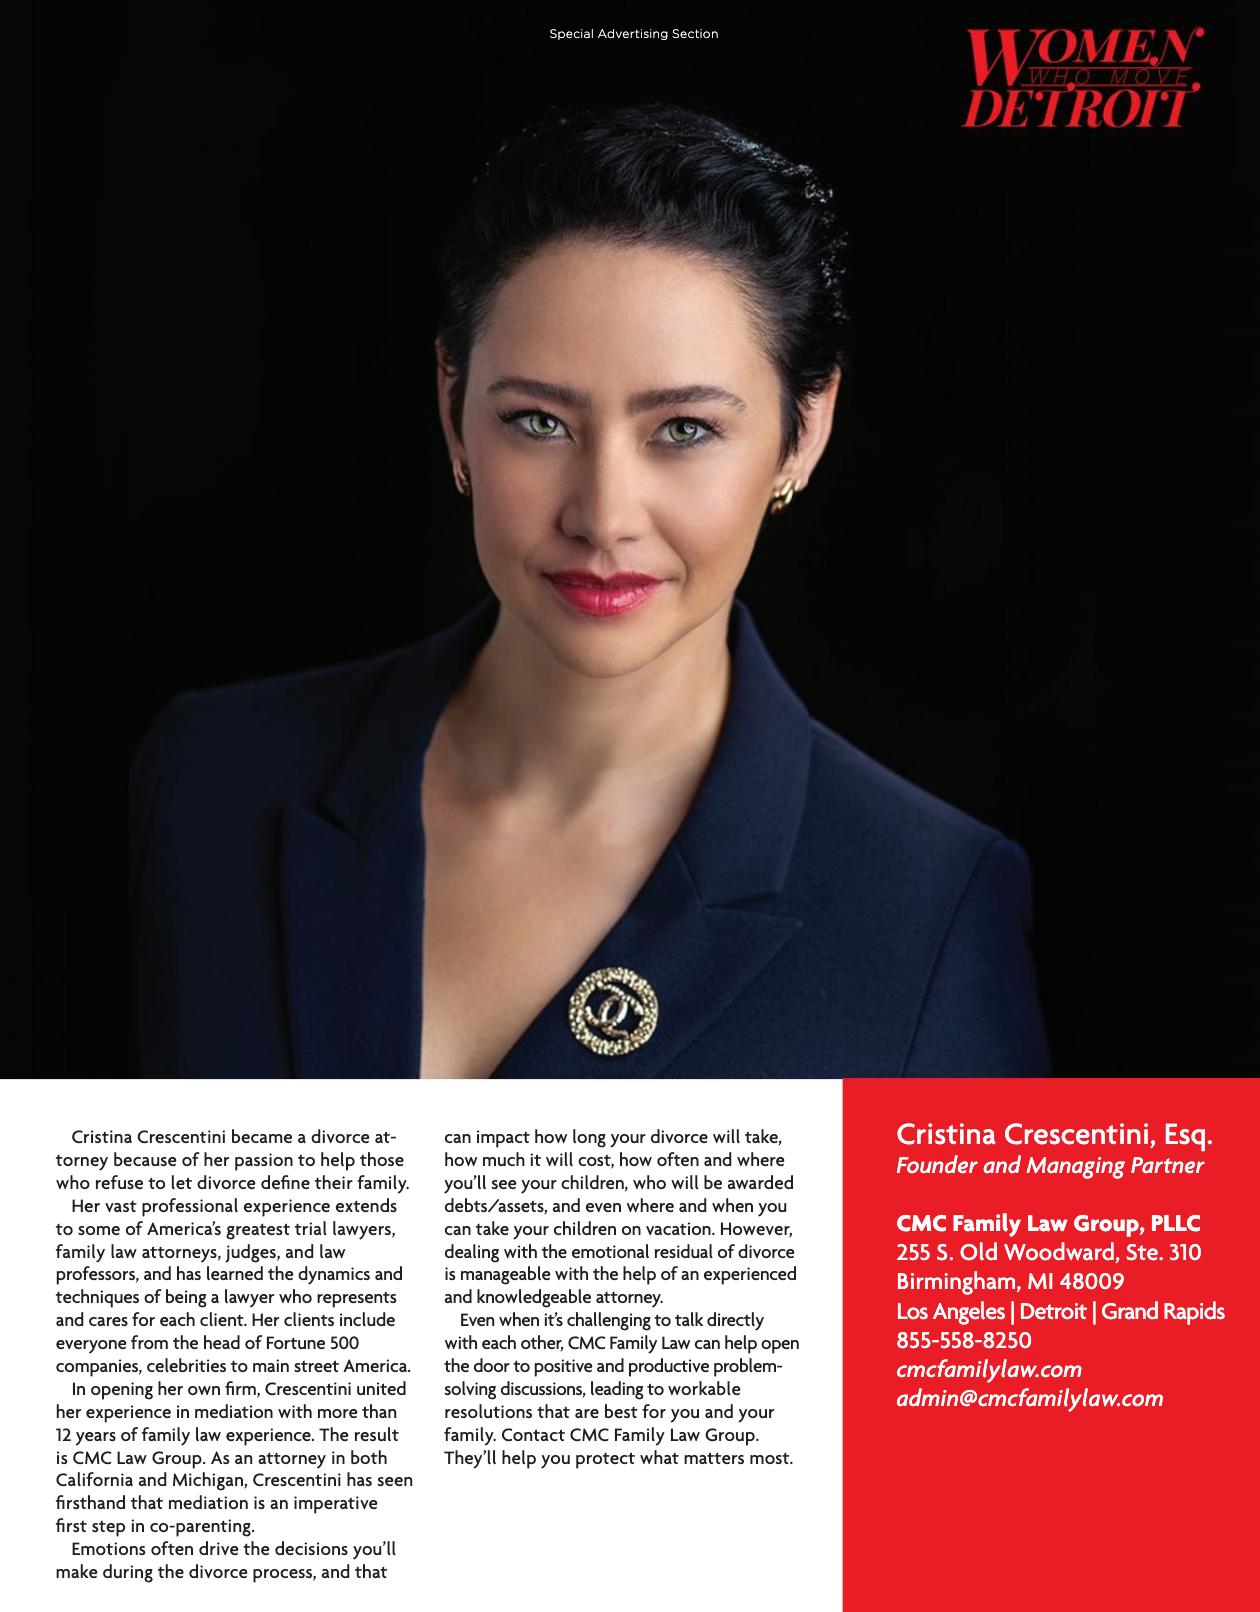 Hour Magazine: Women Who Move Detroit